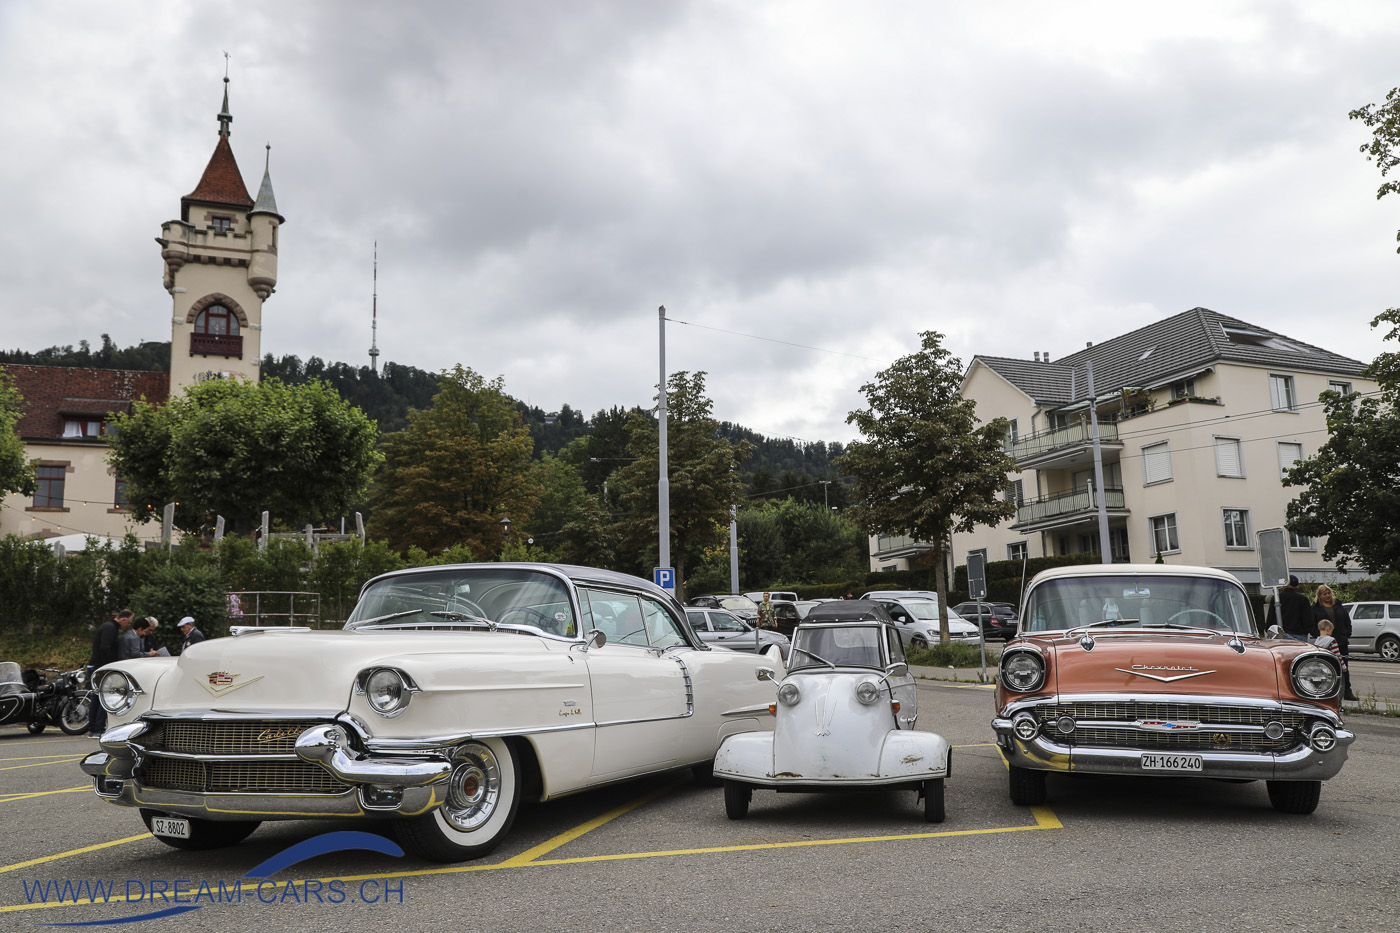 Cadillac, Messerschmitt und Chevrolet Bel Air